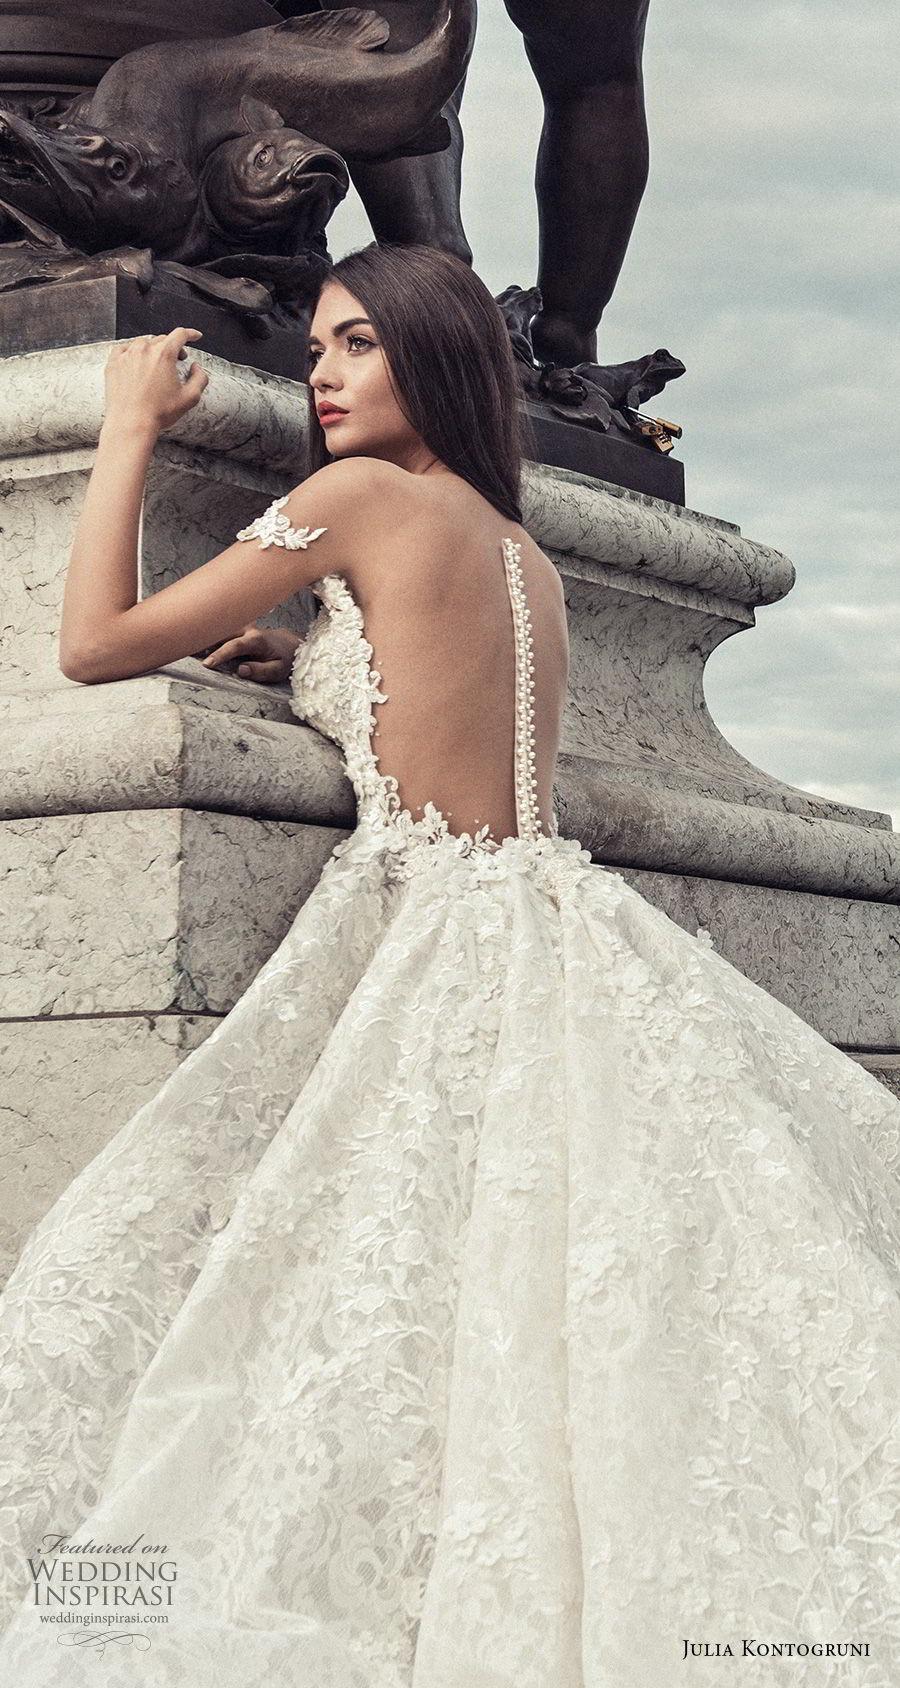 julia kontogruni 2018 bridal off the shoulder sweetheart neckline princess ball gown wedding dress sheer button back royal train (3) zbv